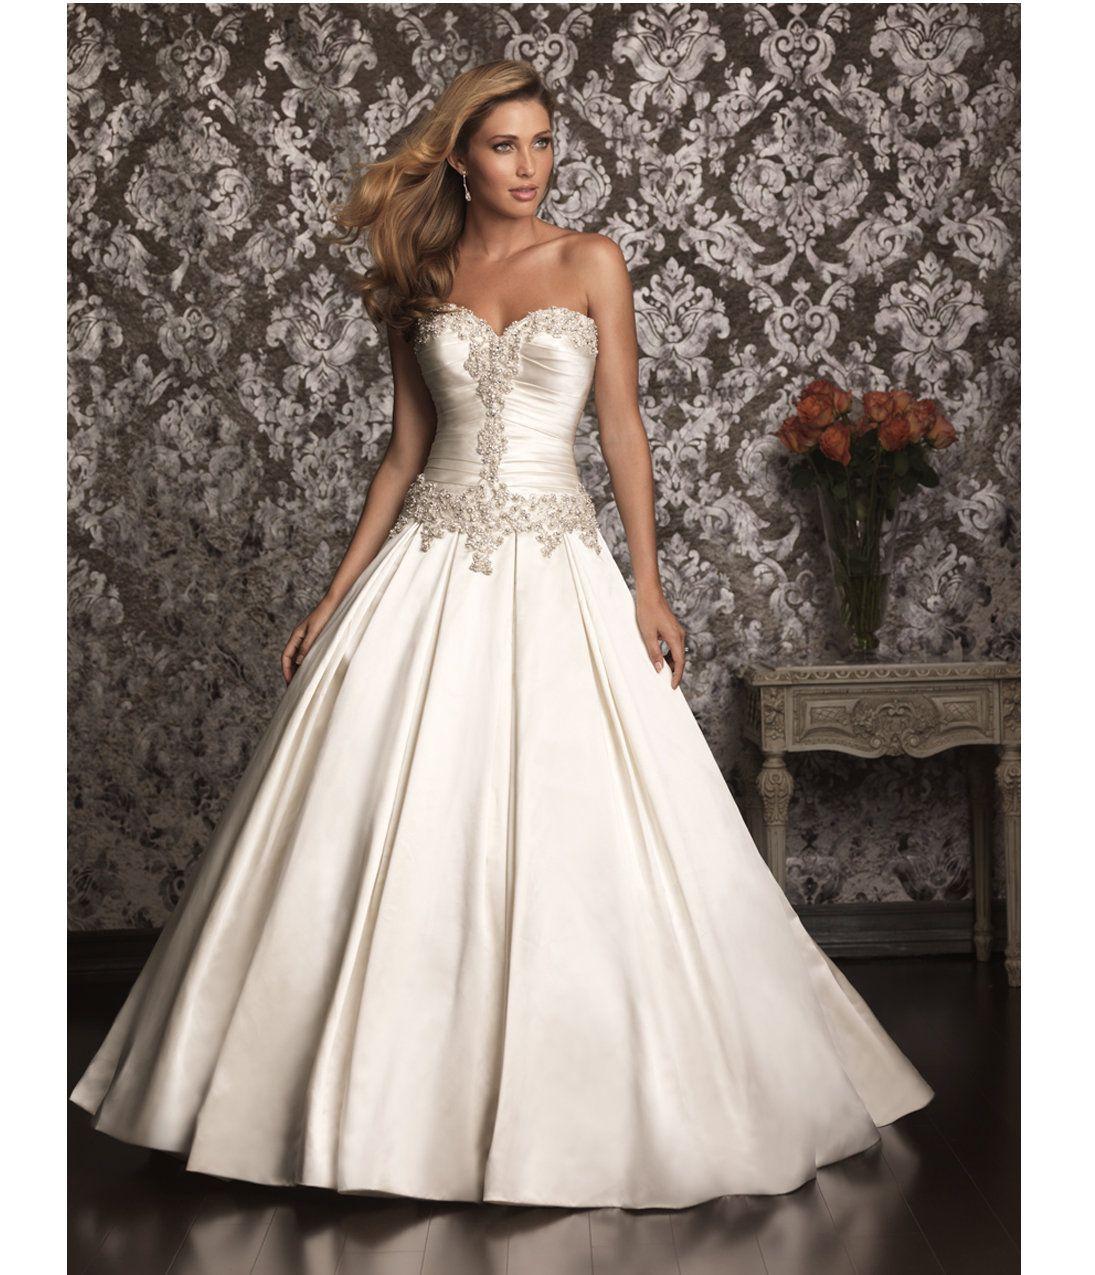 Vintage Wedding Dresses Glasgow: Ivory & Silver Satin Swarvoski